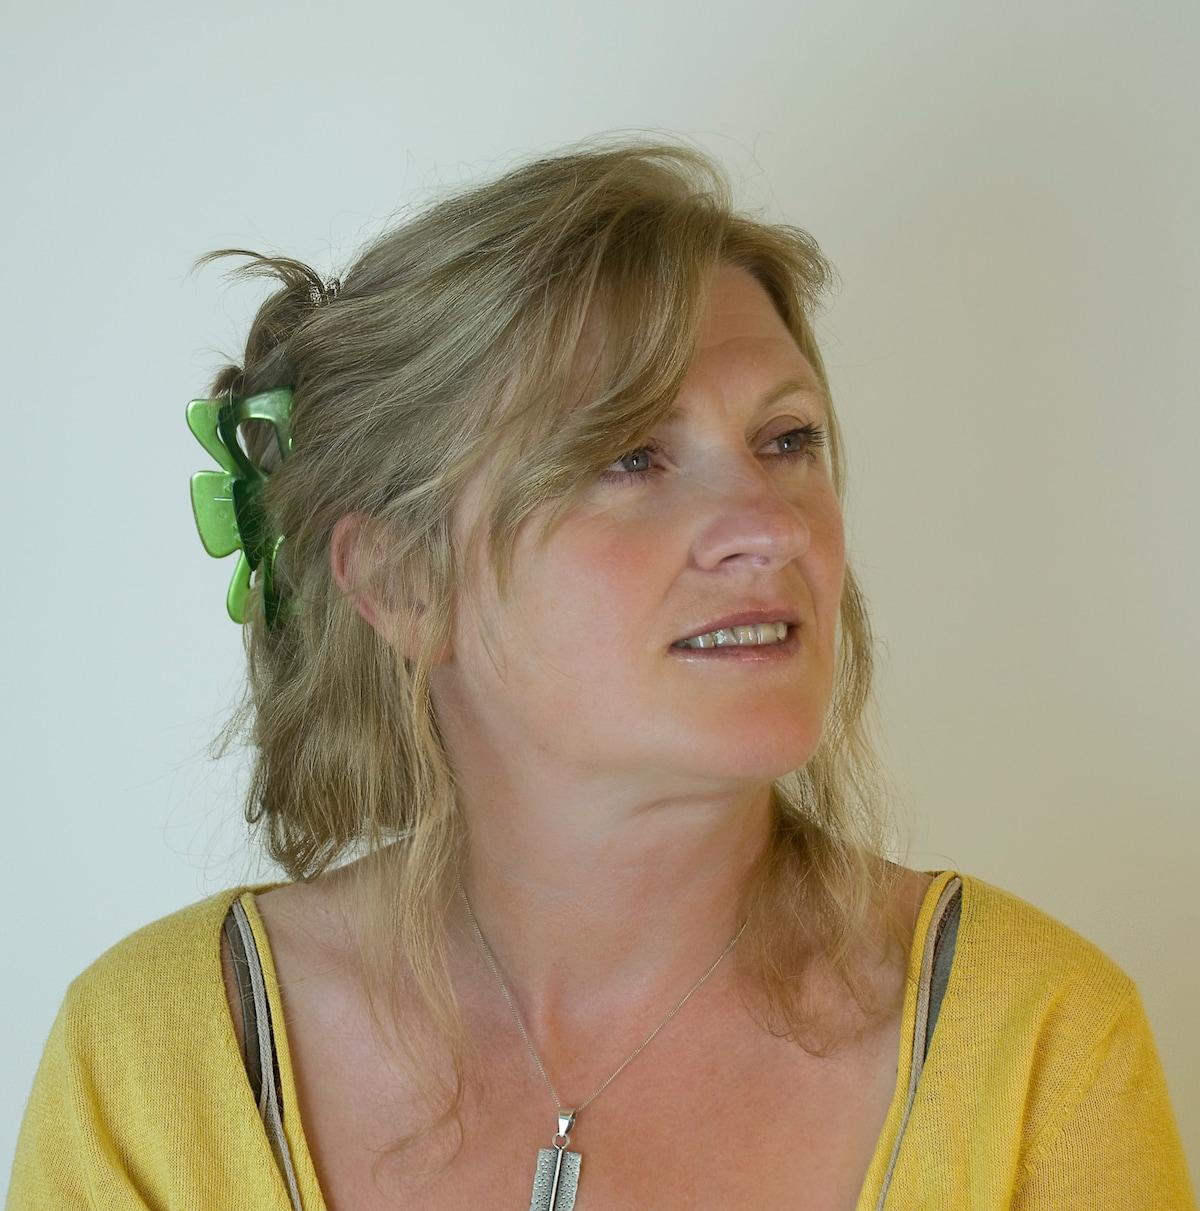 Clare from Kilcolgan